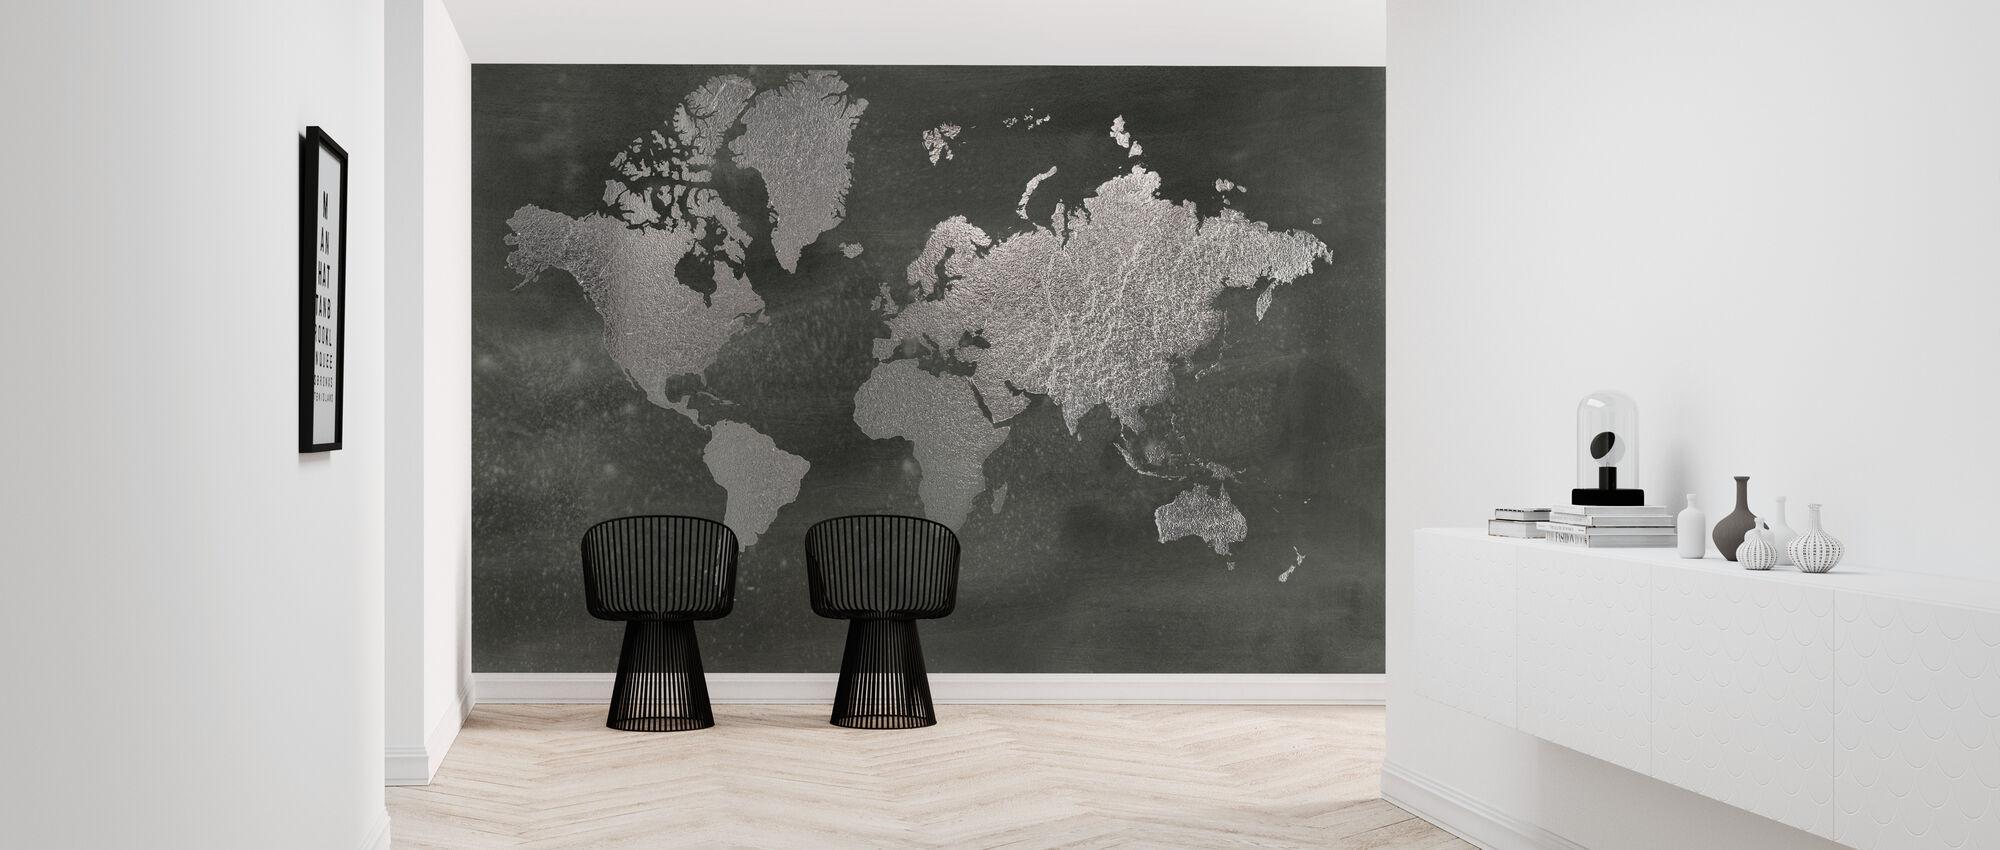 World Map on Black Wash - Wallpaper - Hallway